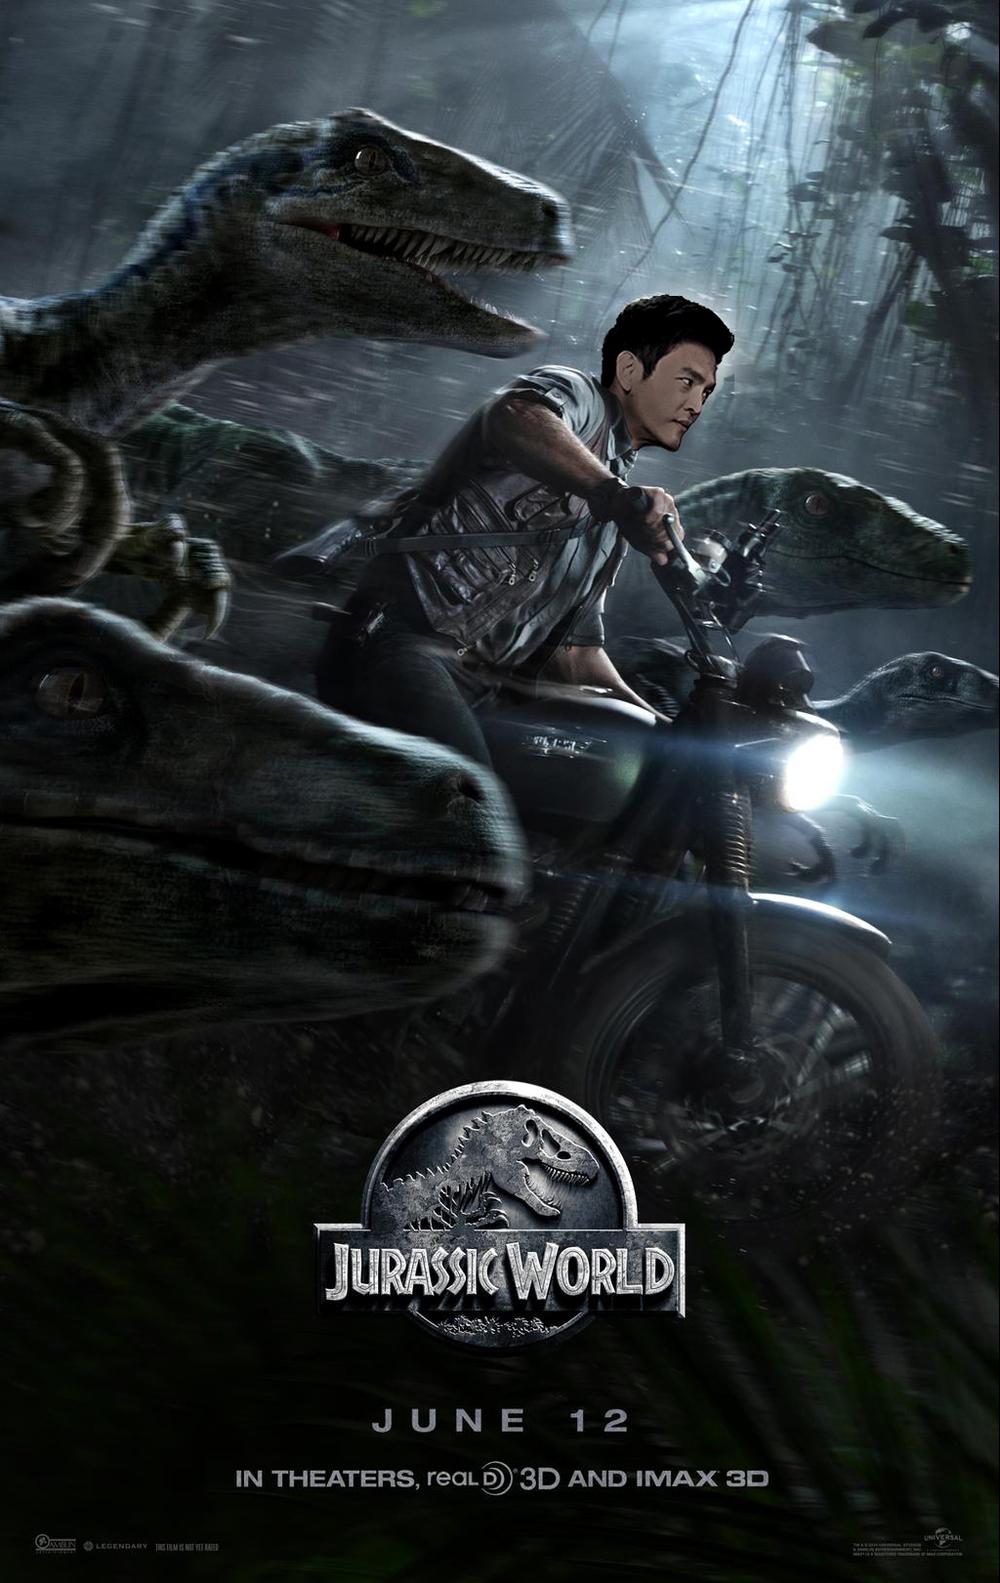 chojurassicworld